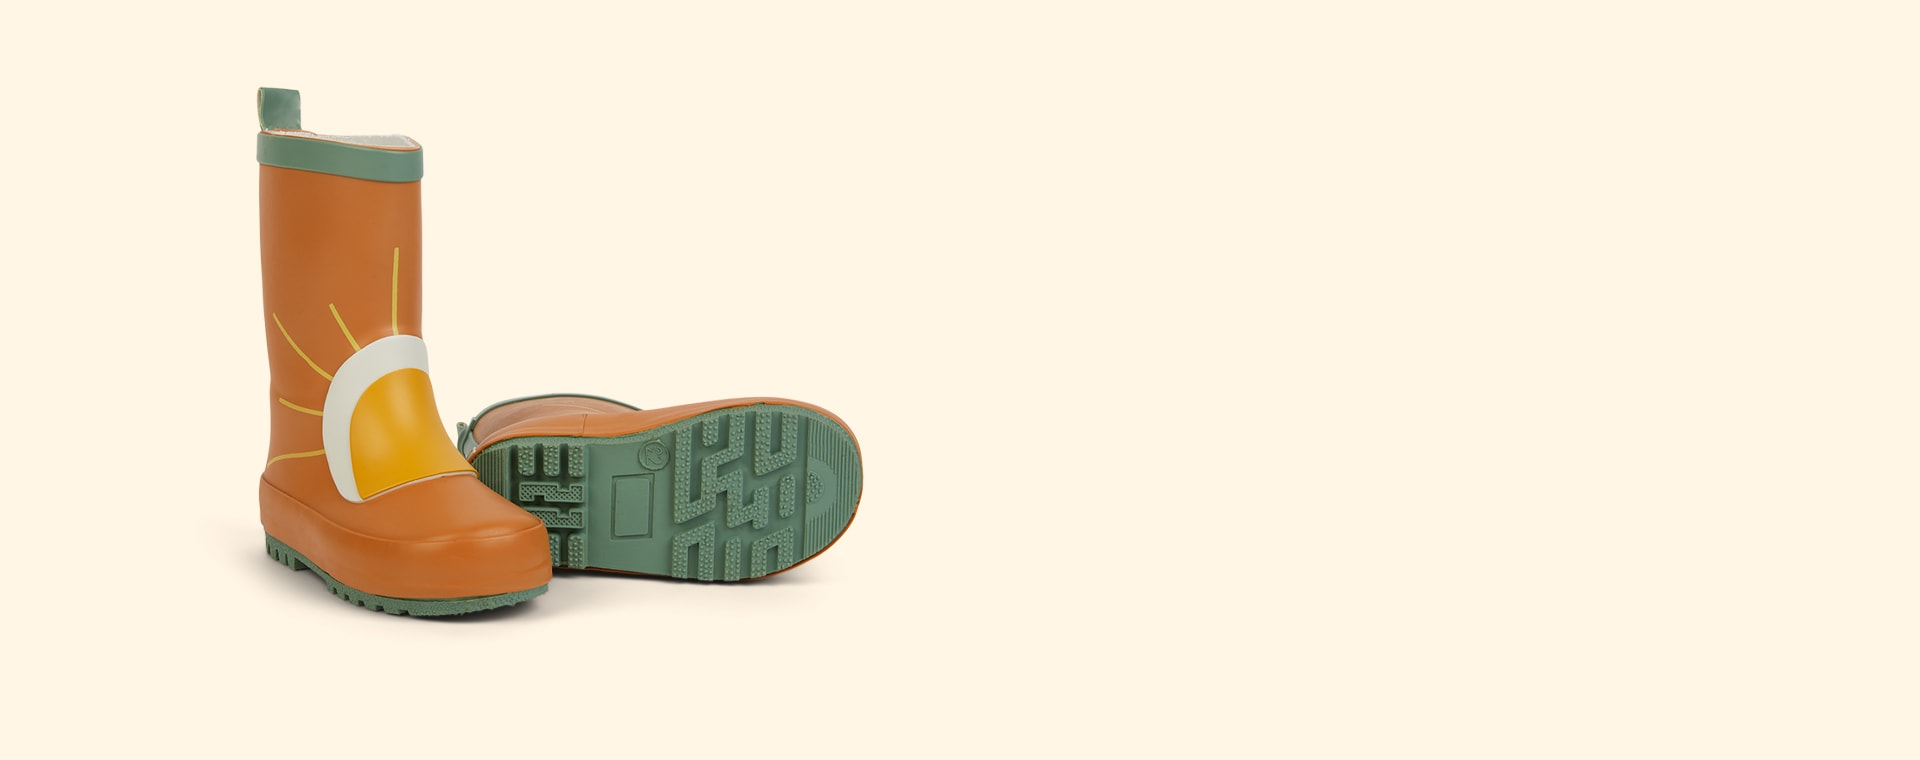 Sun-Spice Grech & Co Rubber Boots